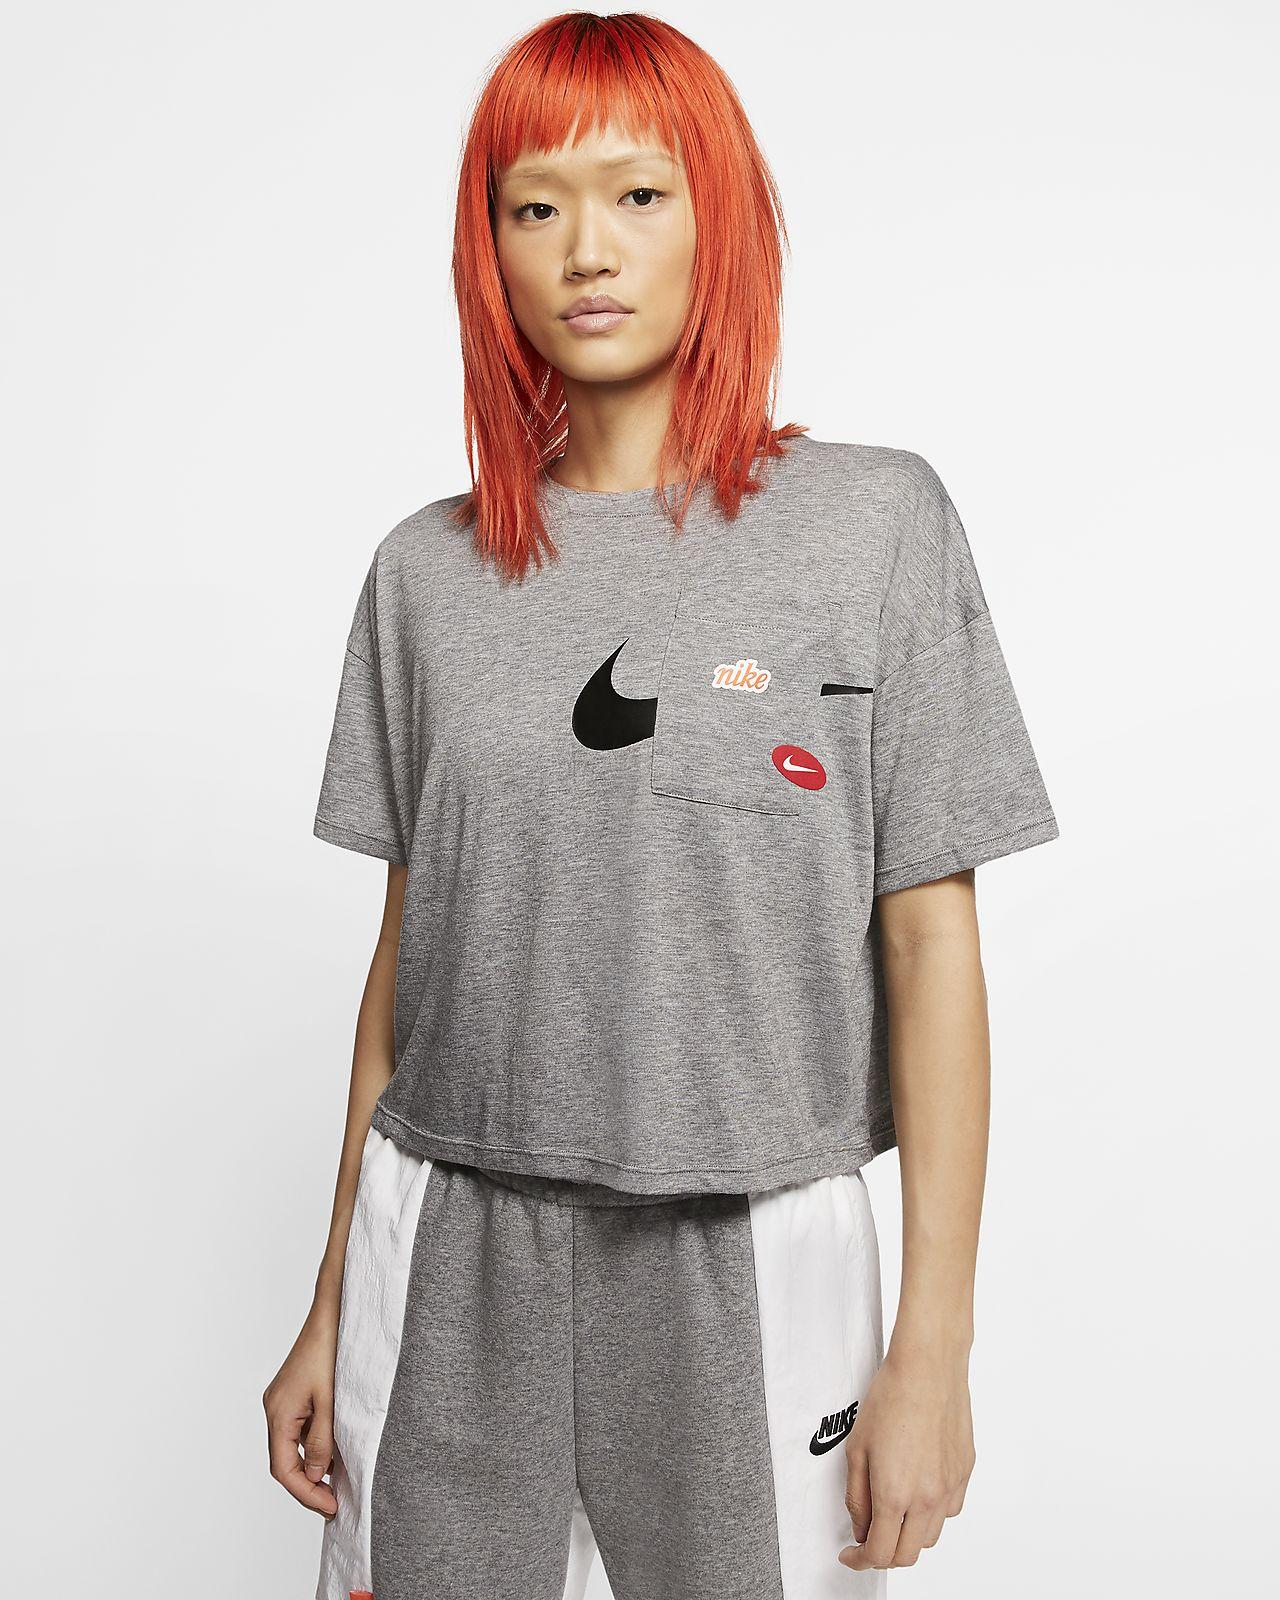 Nike Icon Clash Women's Short-Sleeve Training Top